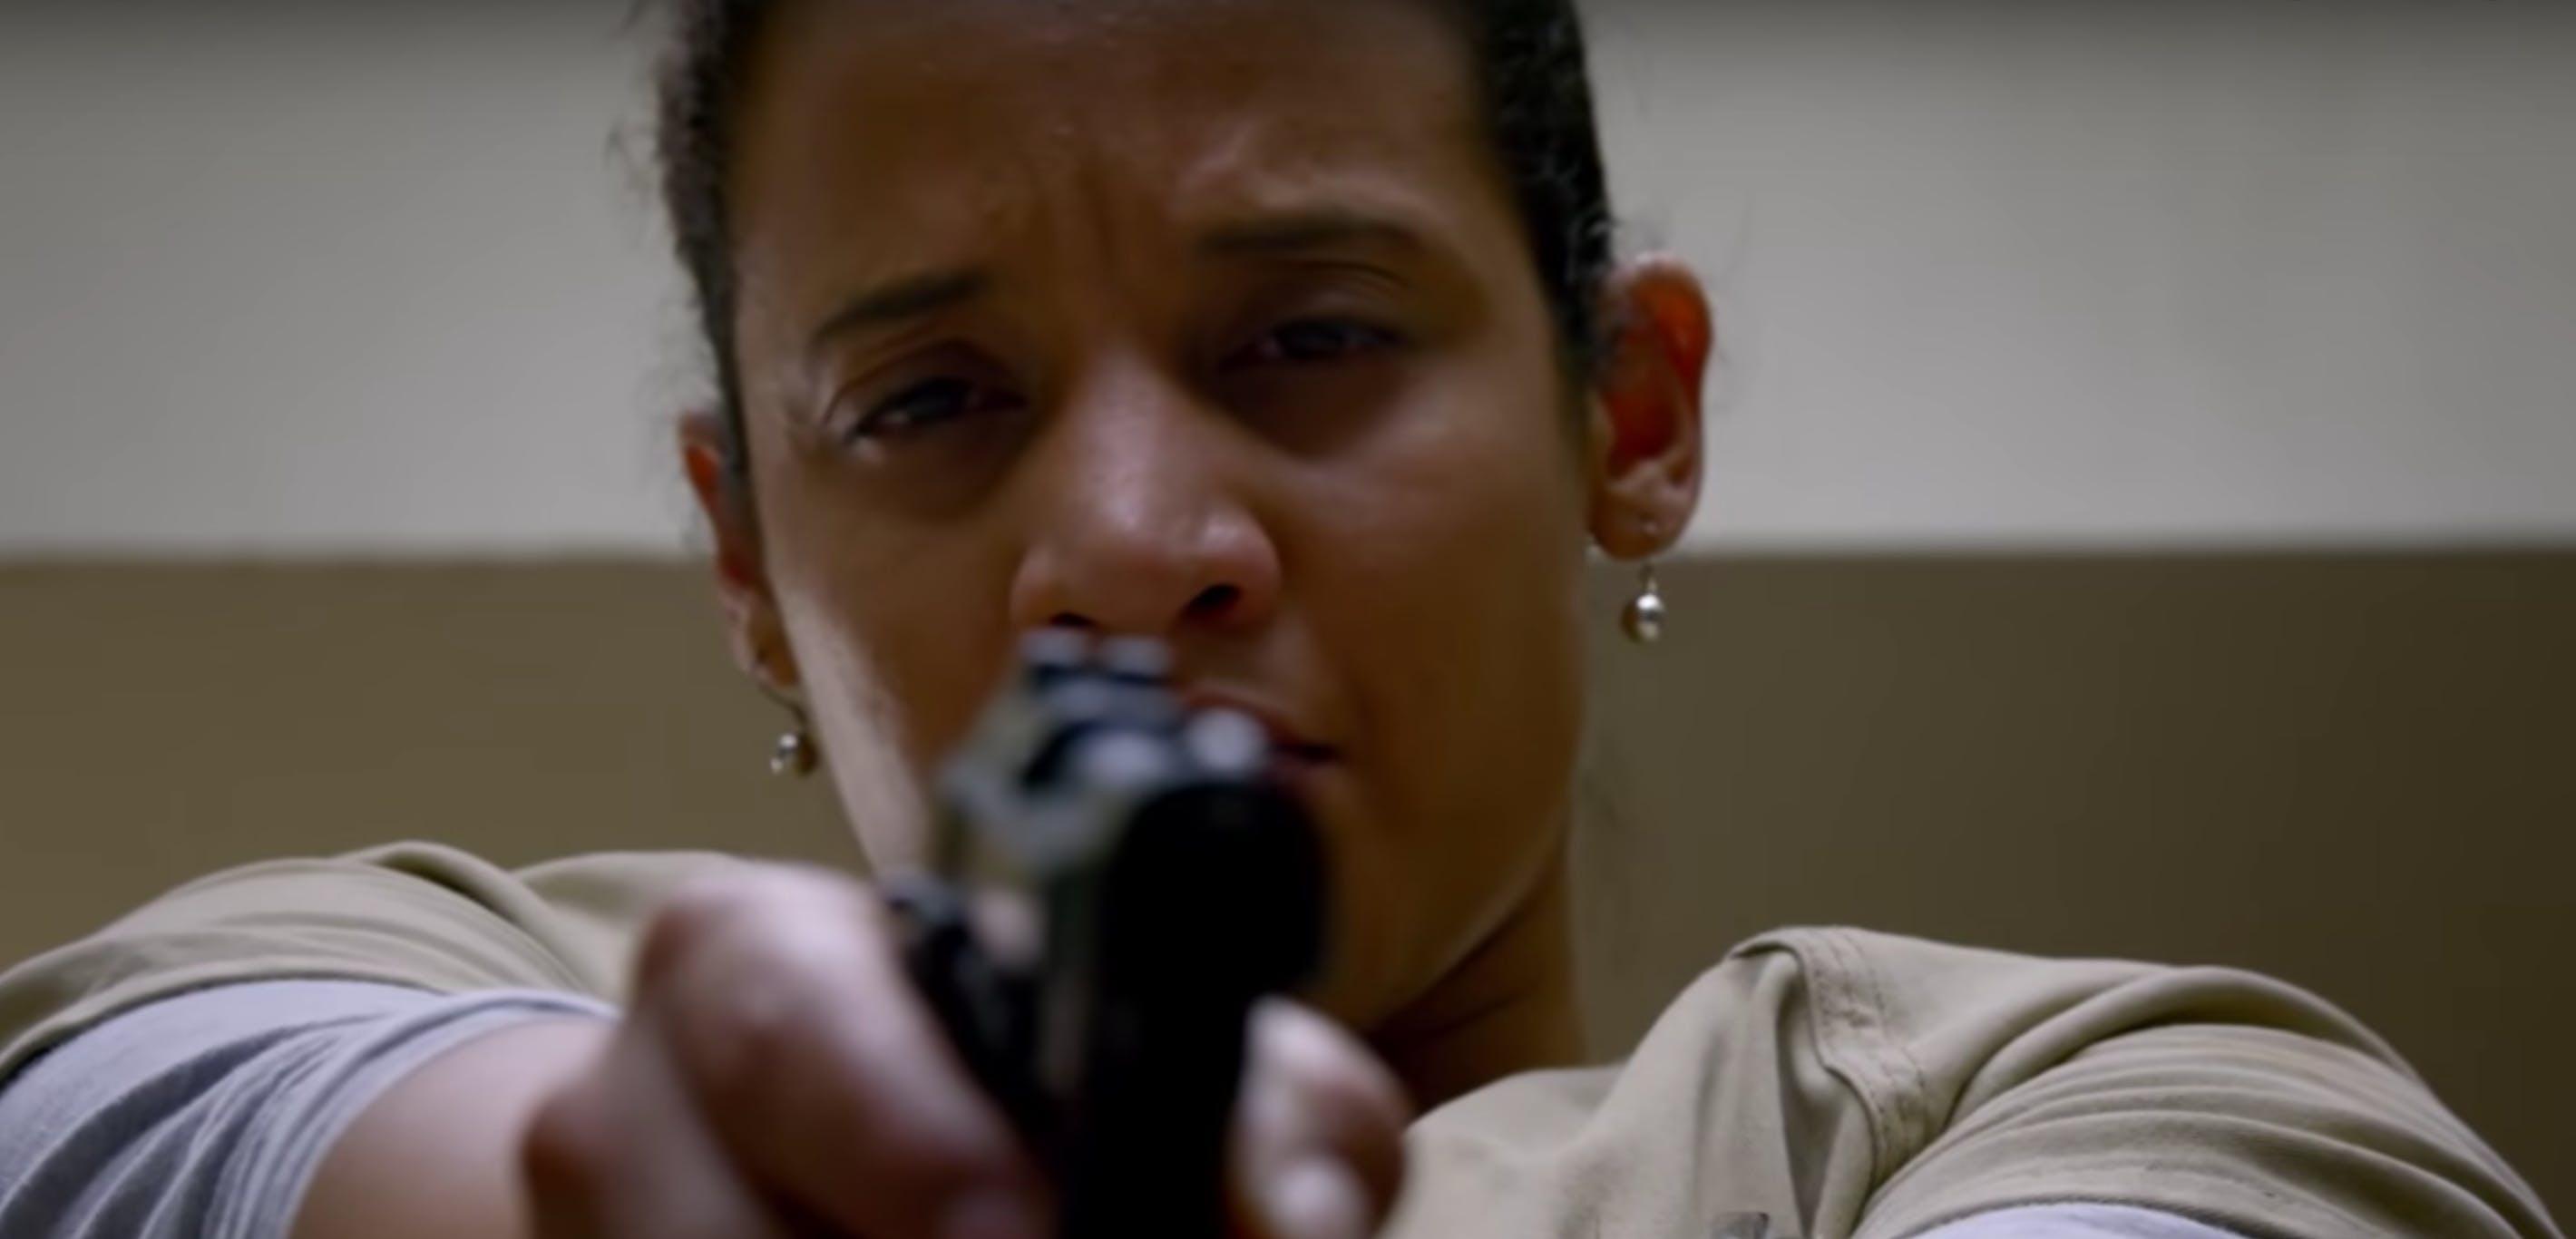 Dayanara Diaz in Orange Is the New Black season 5 trailer